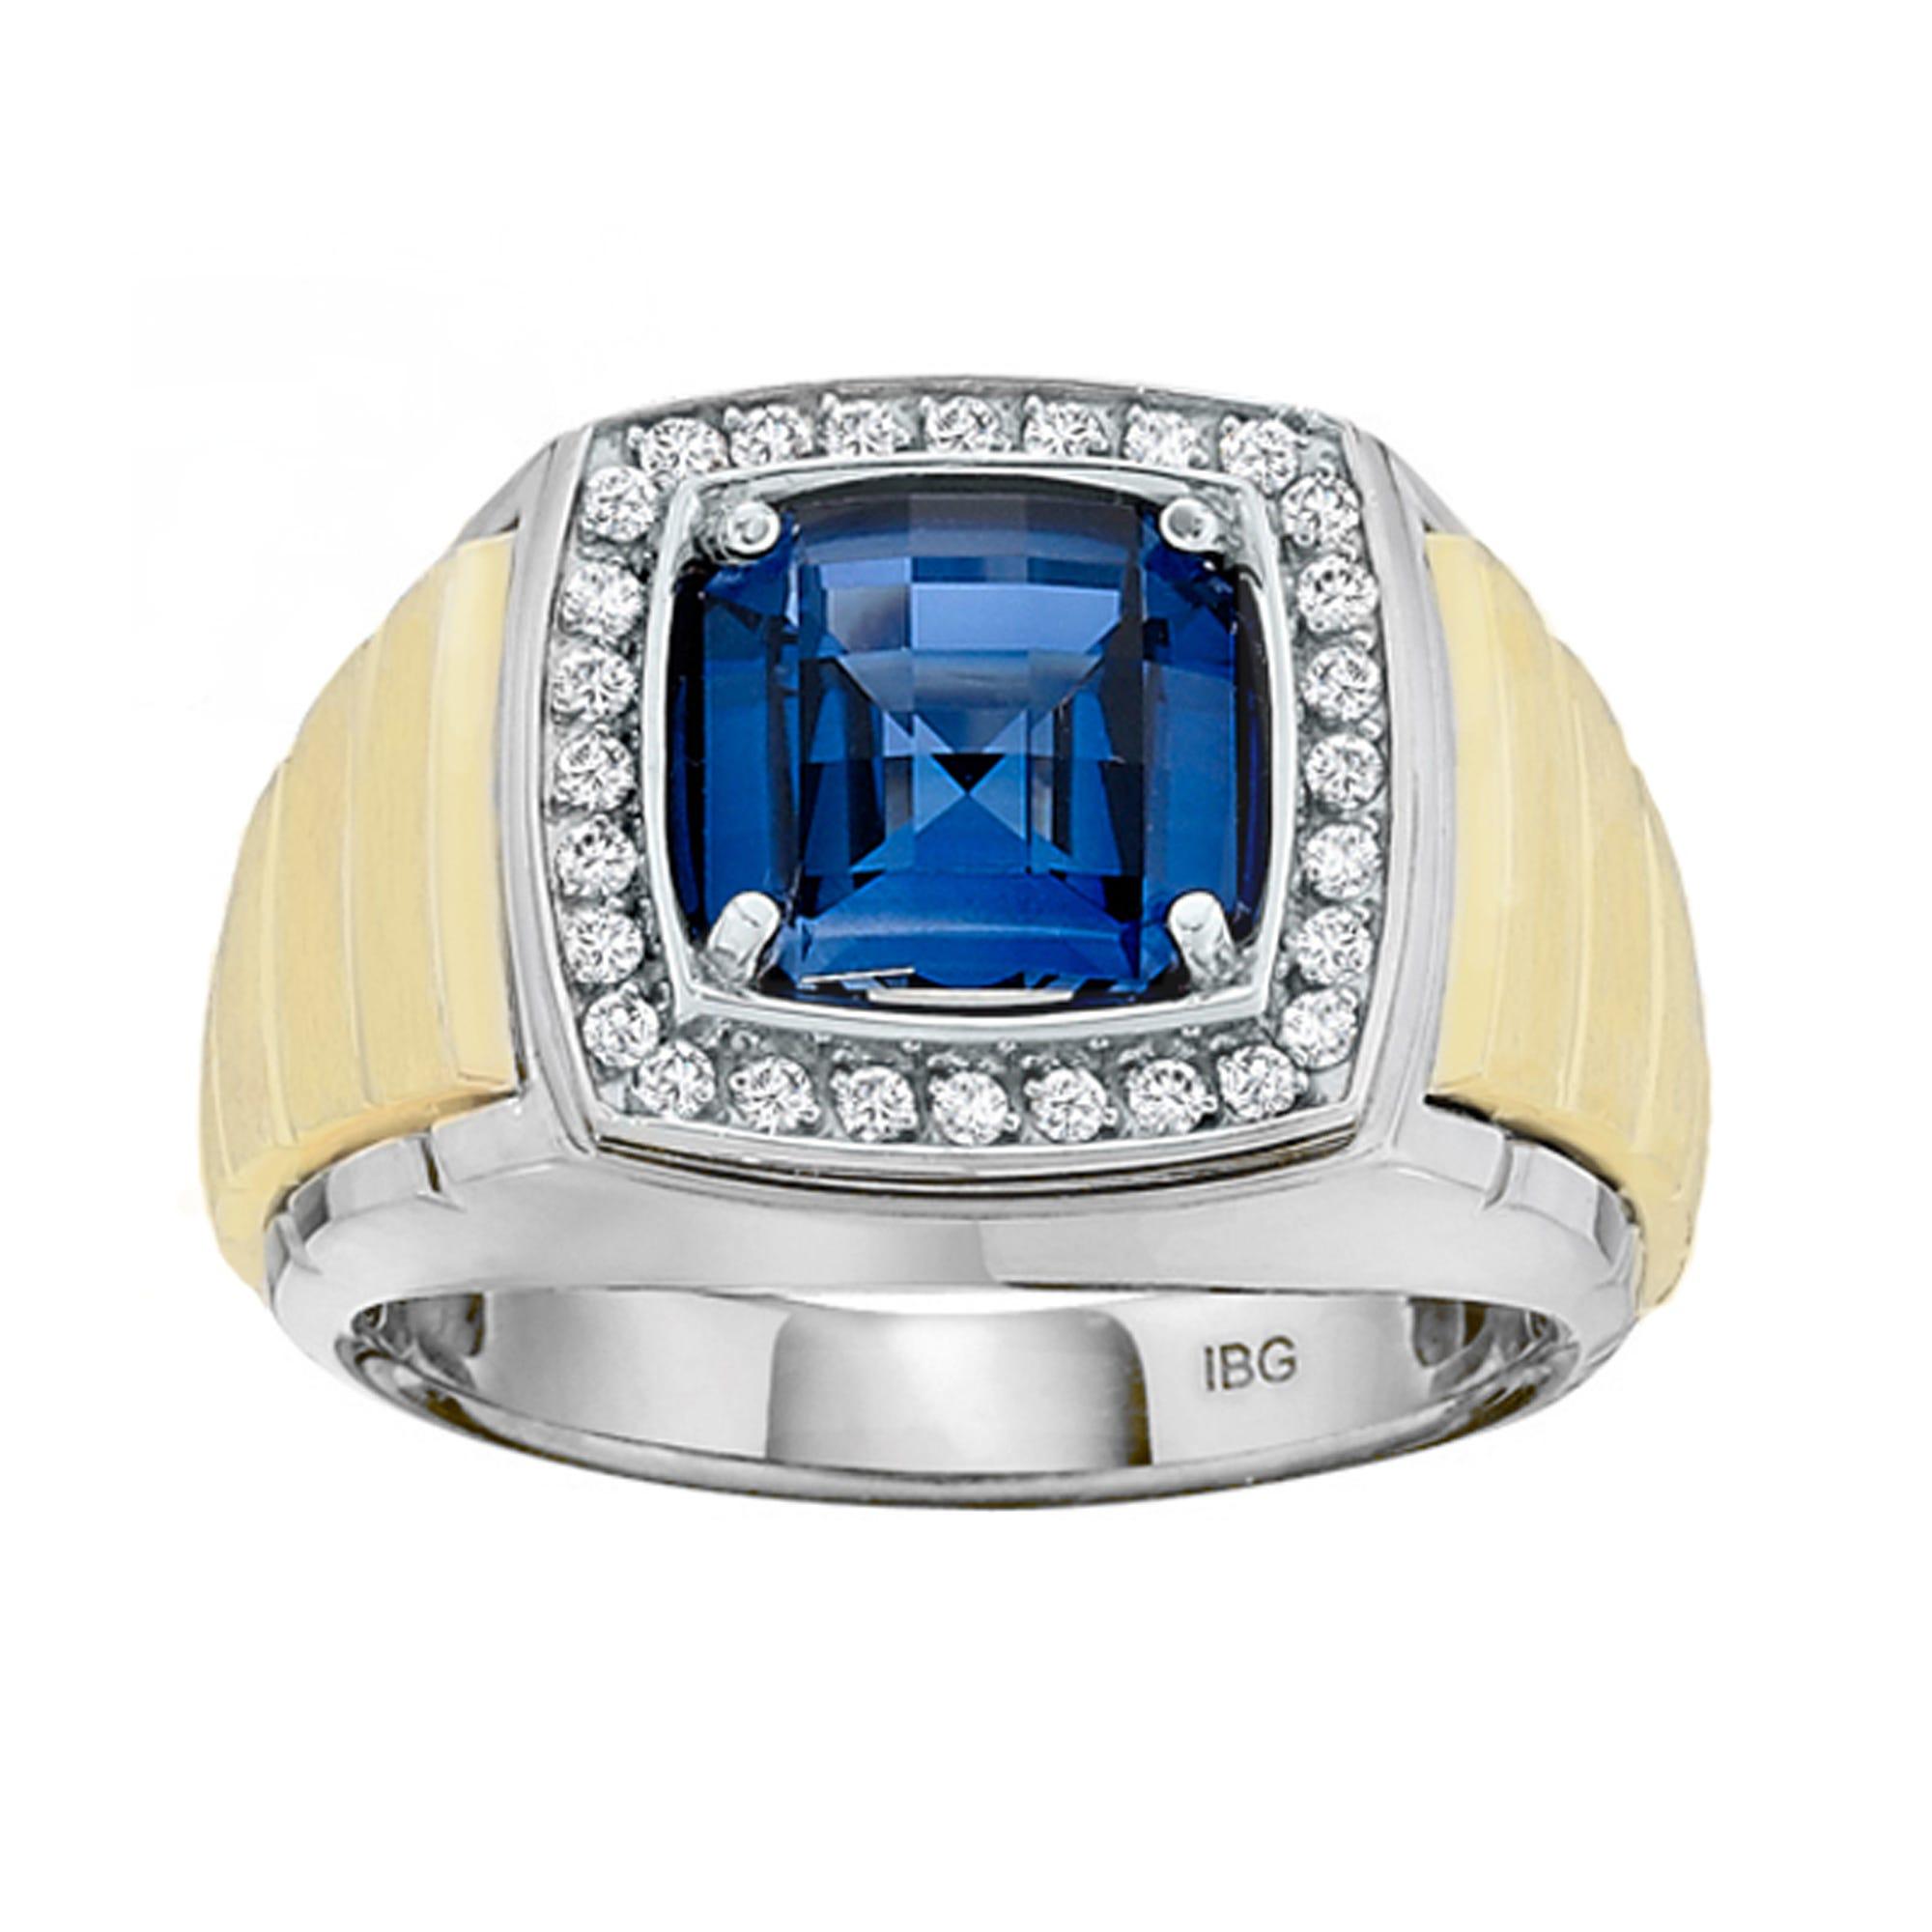 IBGoodman Men's Created Sapphire 1/4ctw. Diamond Ring Sterling Silver & Yellow Gold